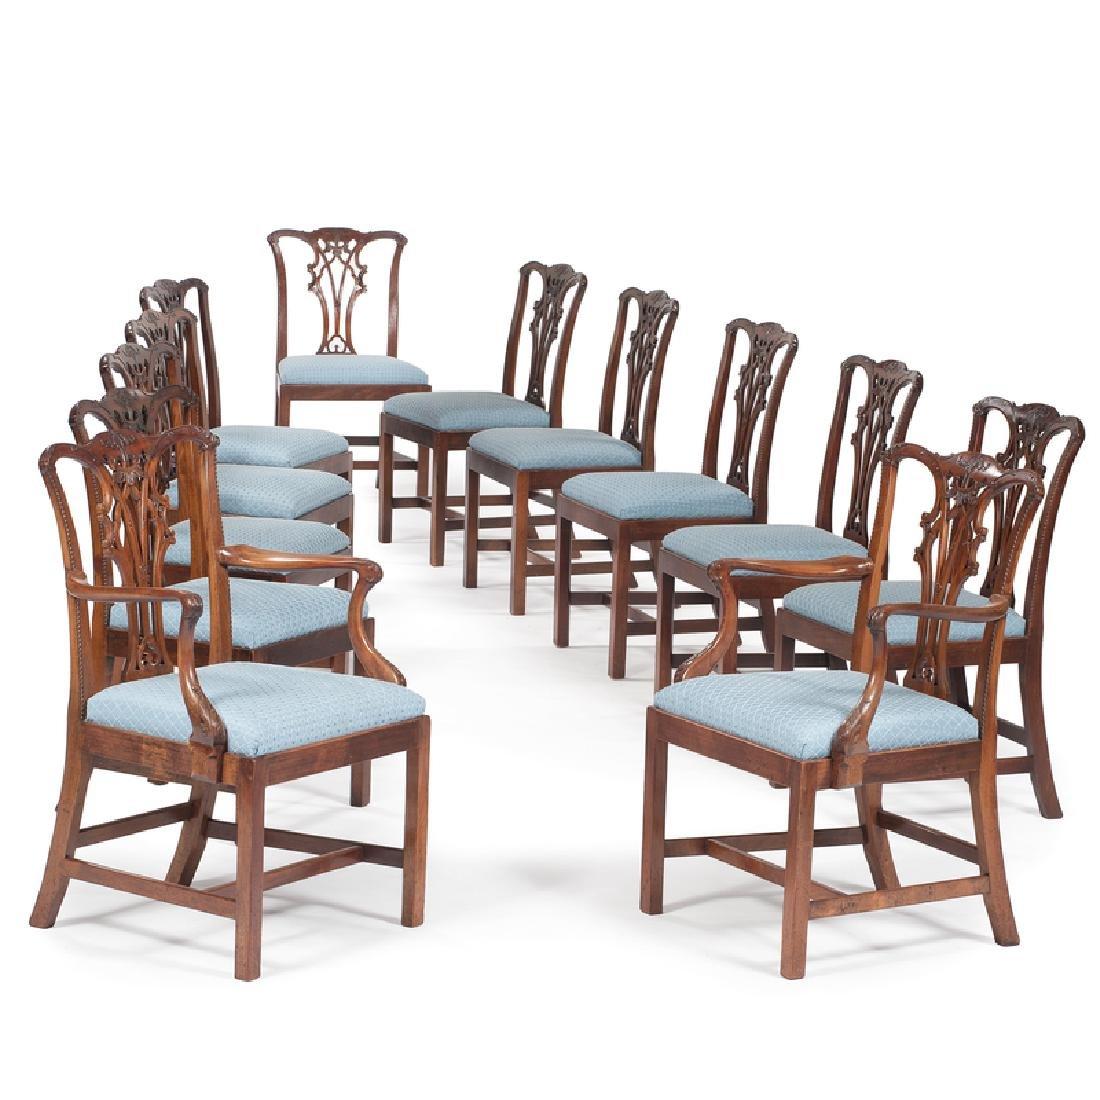 Twelve George III Chippendale Chairs